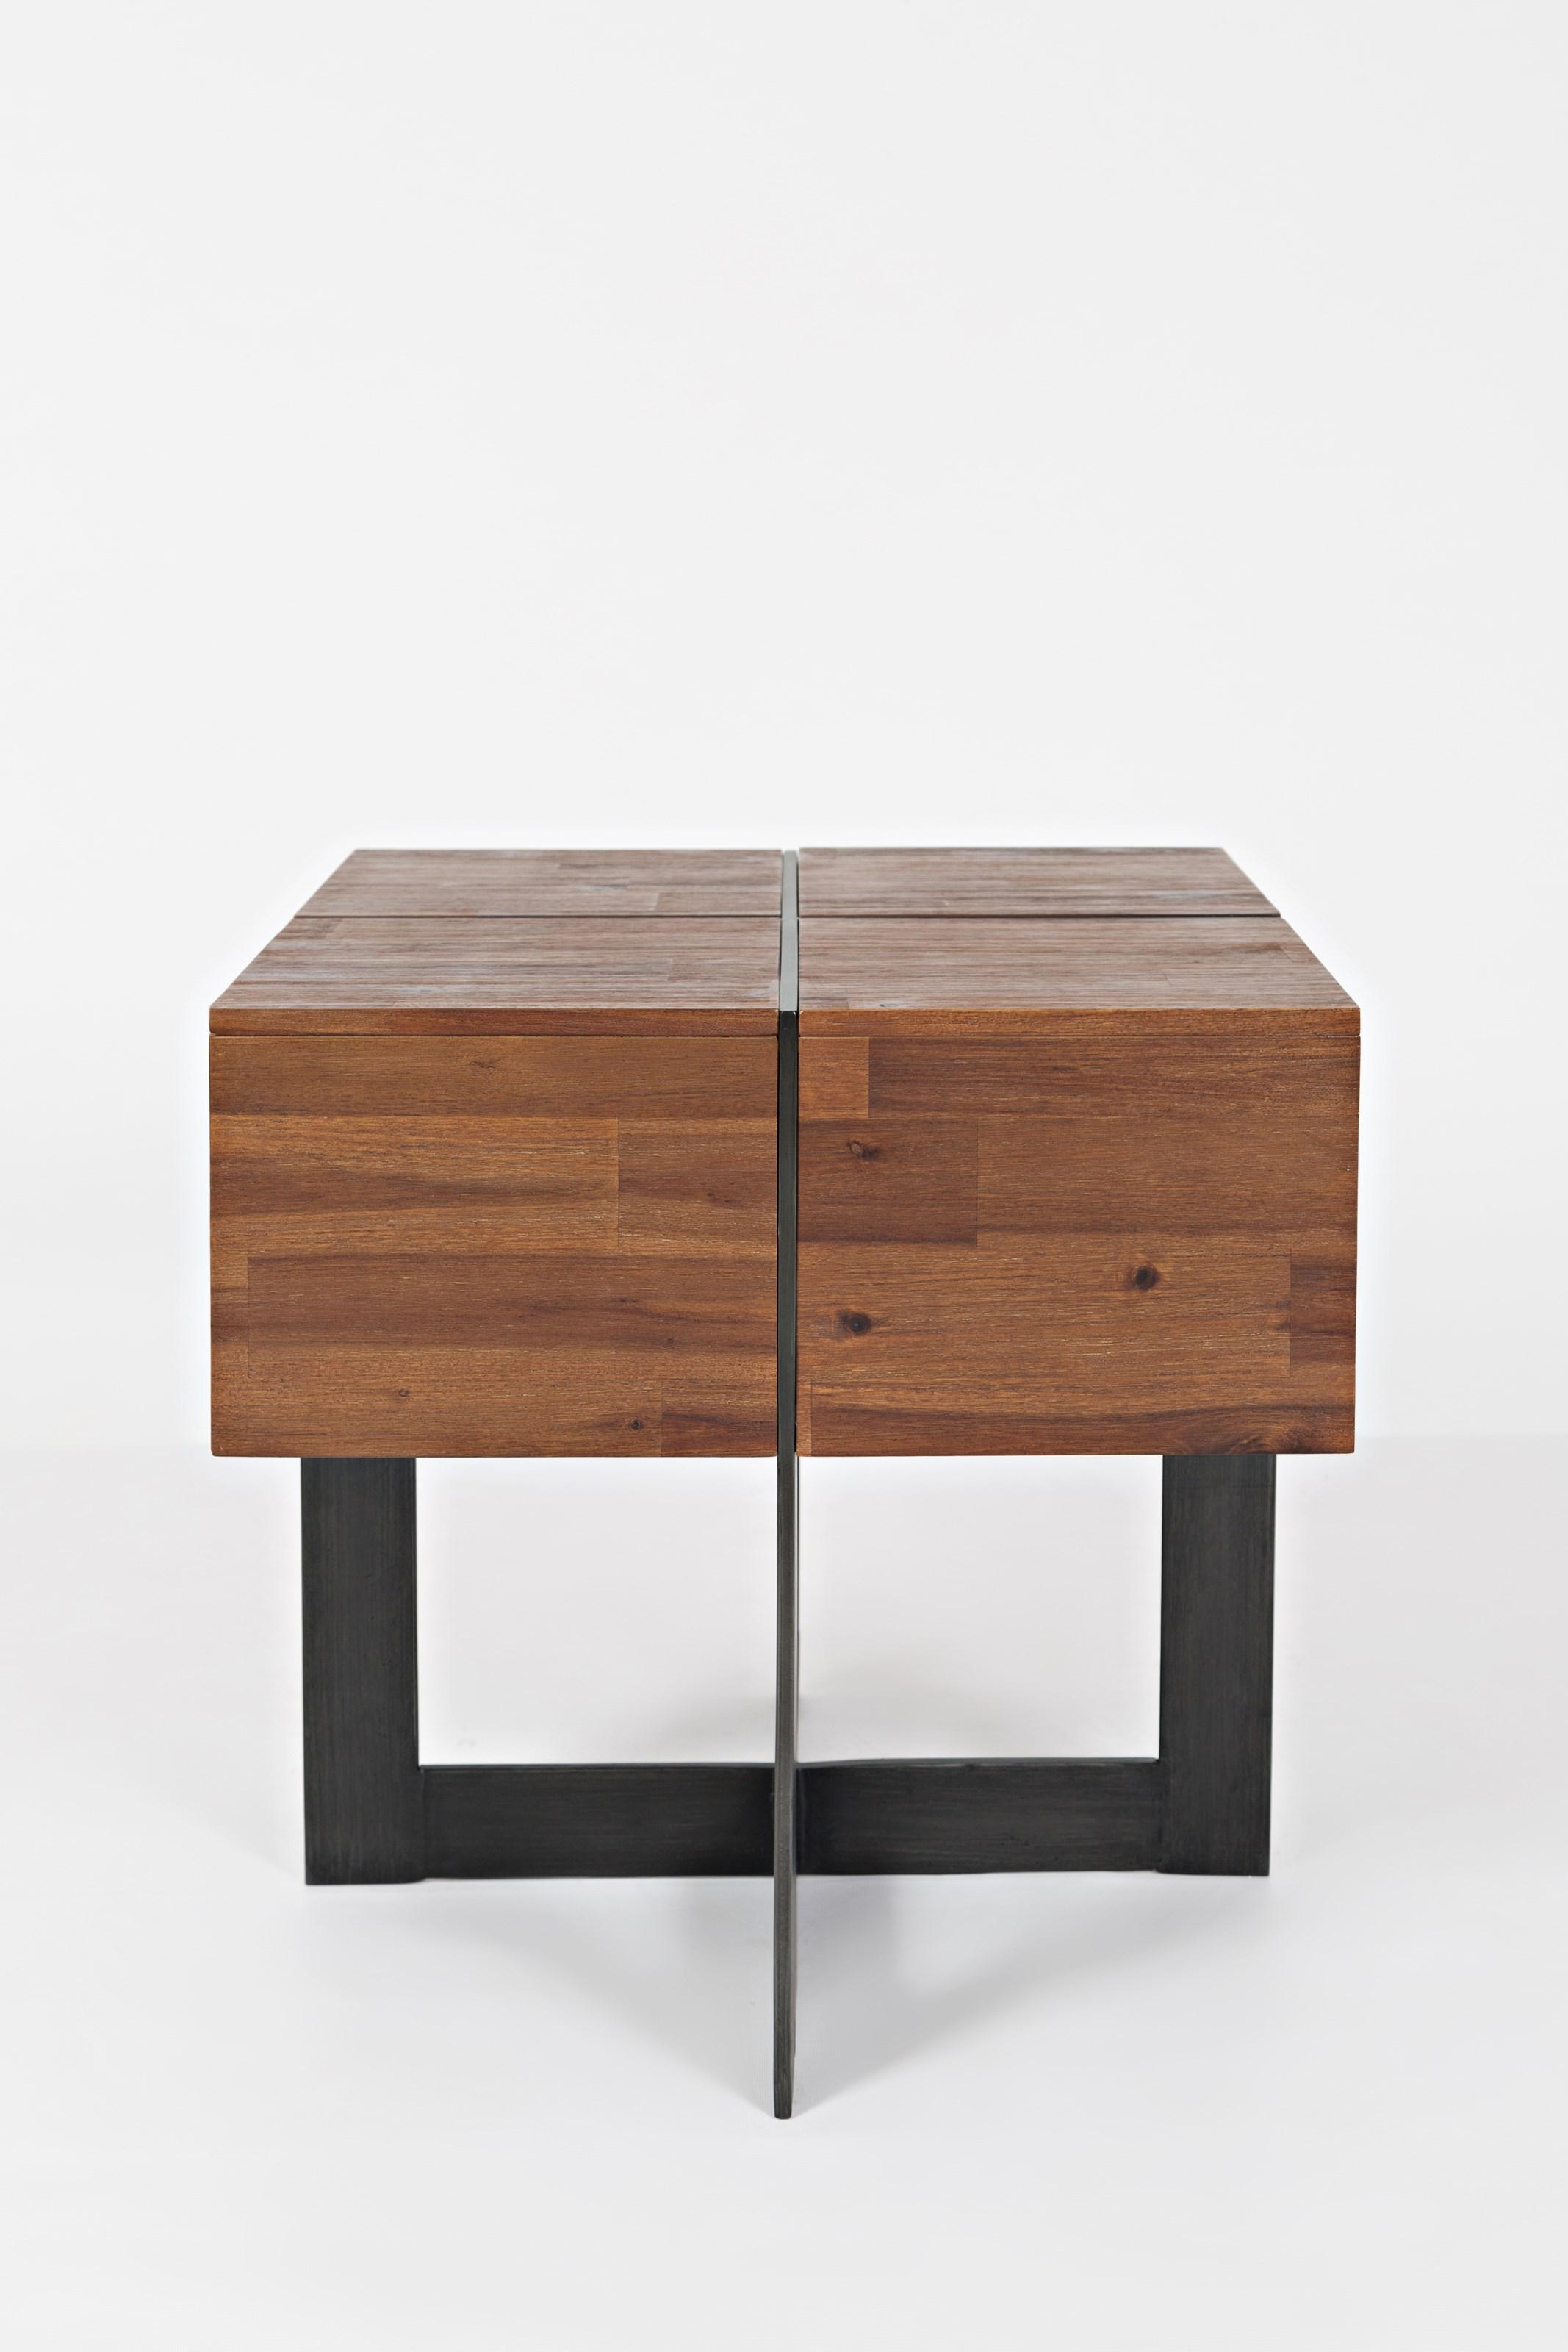 Studio 16 Floating End Table Belfort Furniture